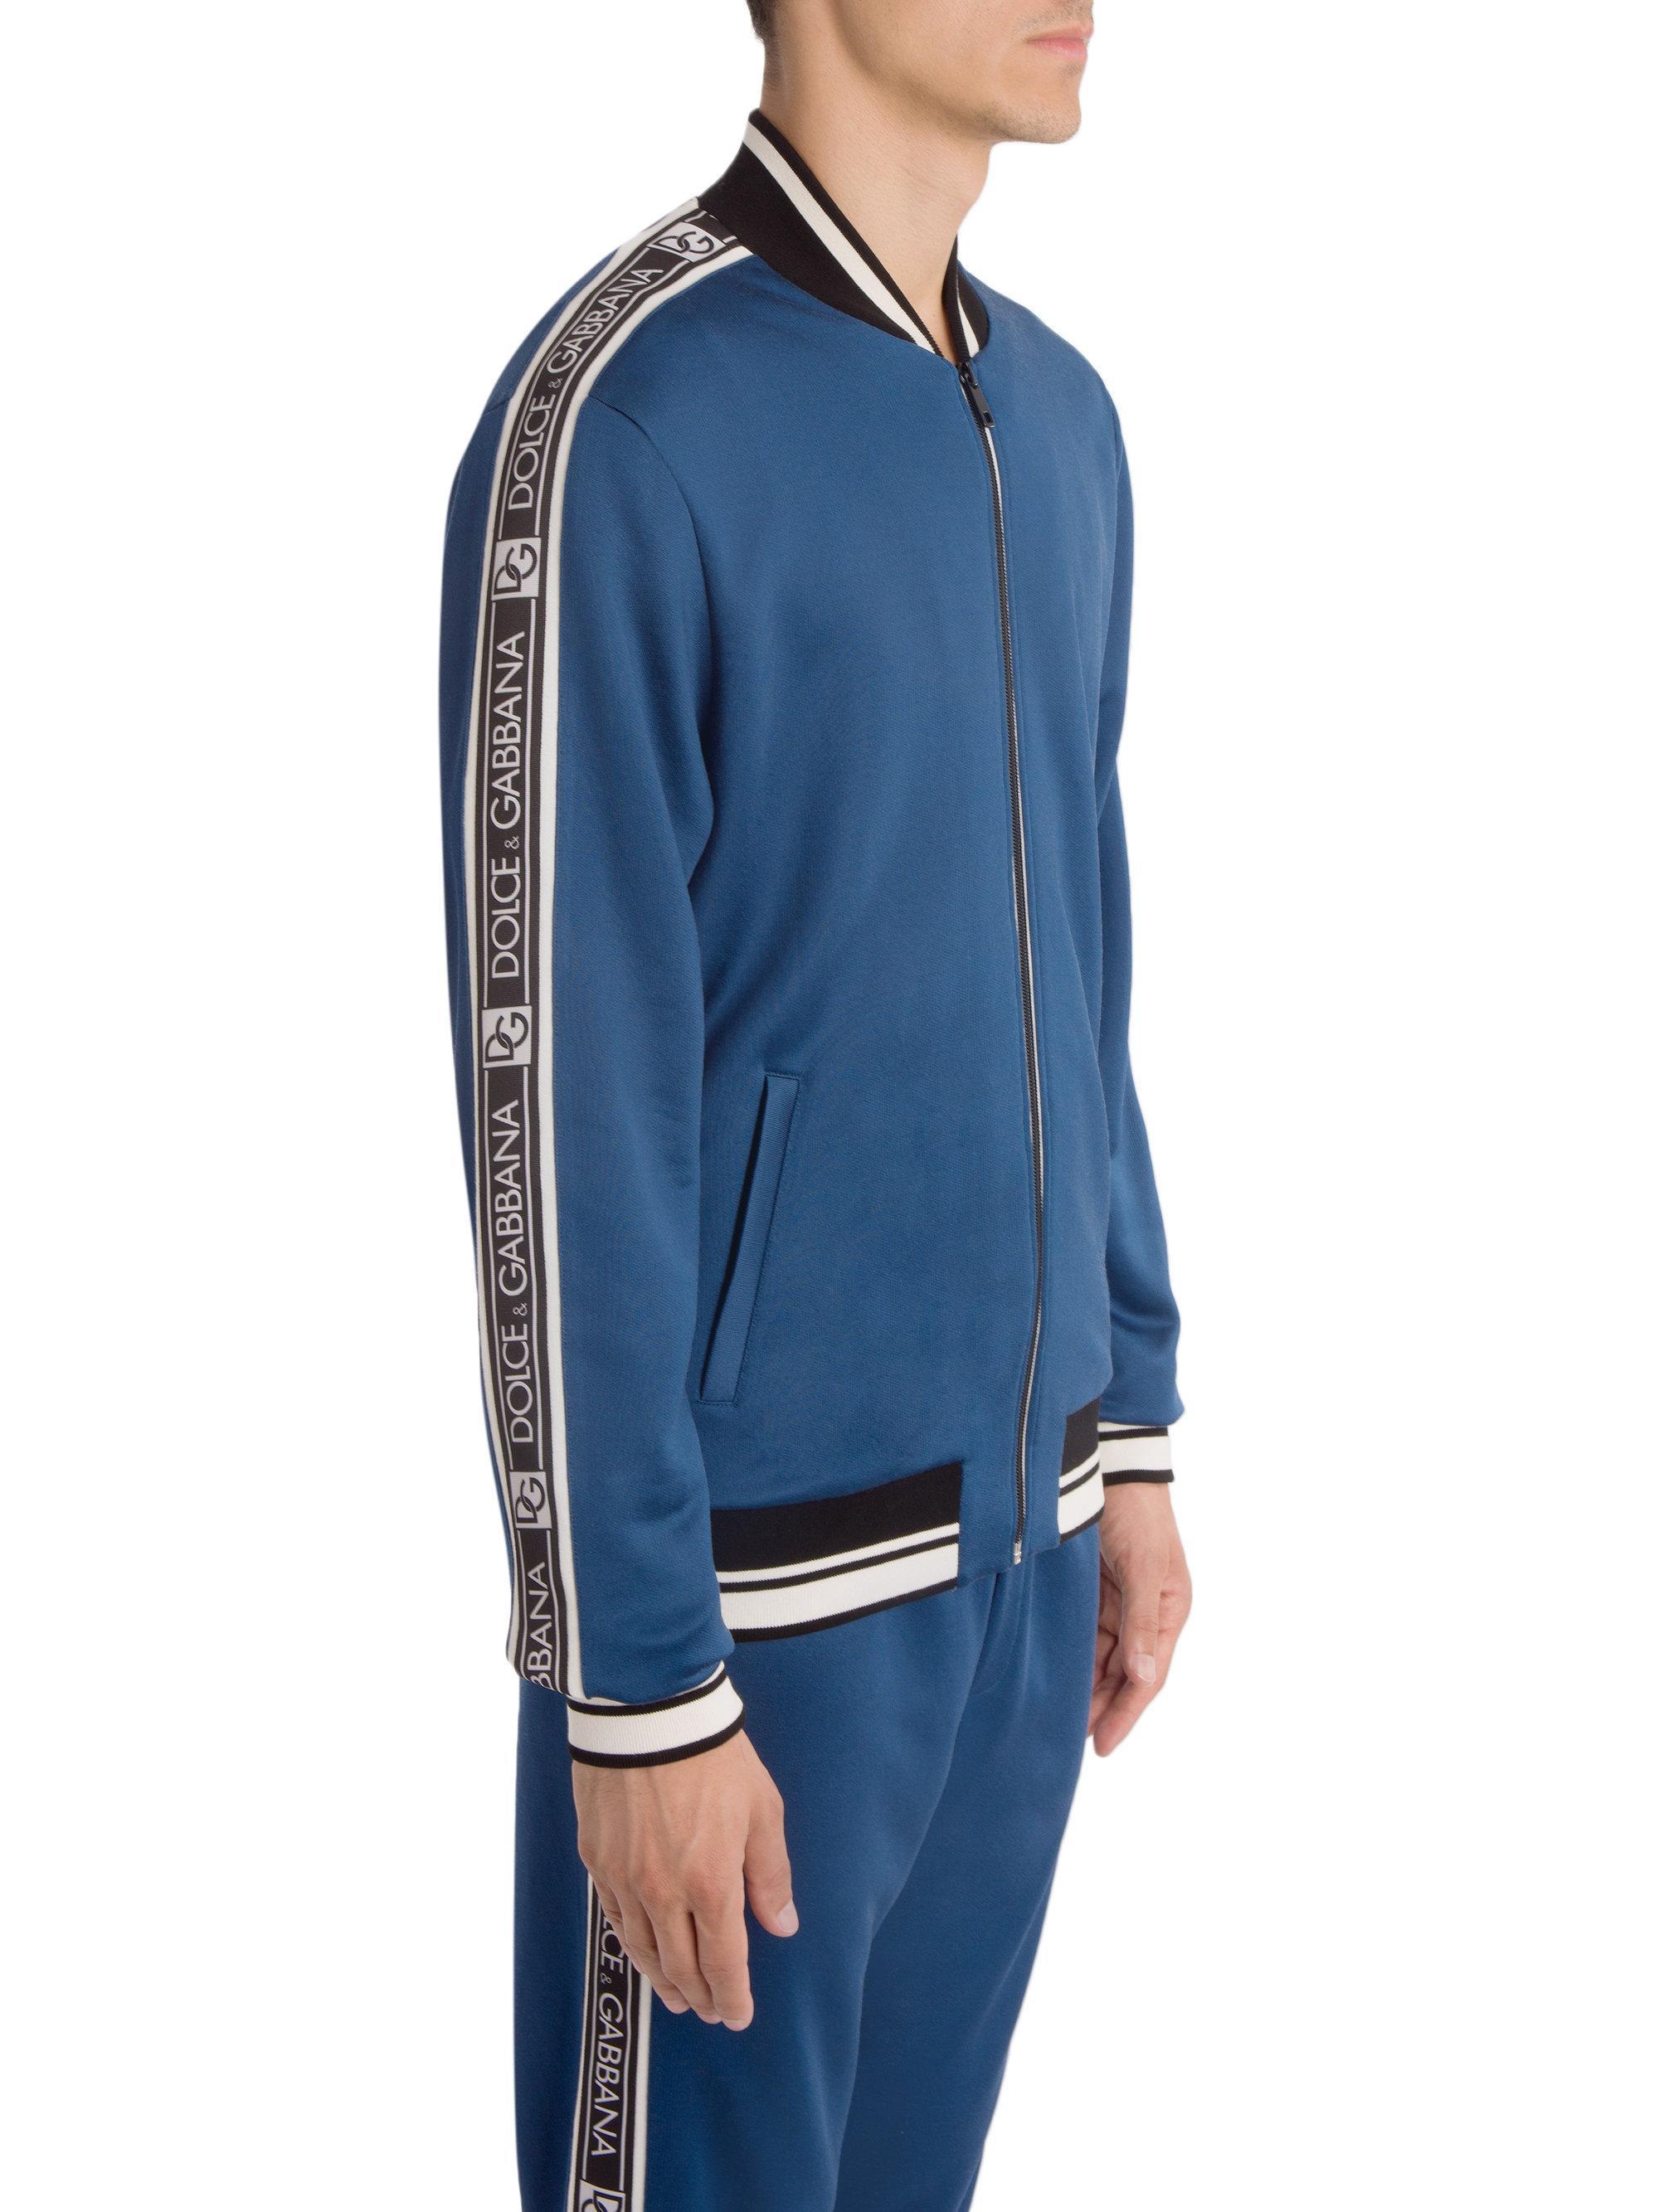 Lyst - Dolce   Gabbana Cotton Logo Trim Track Jacket in Blue for Men 69cbb79de07b